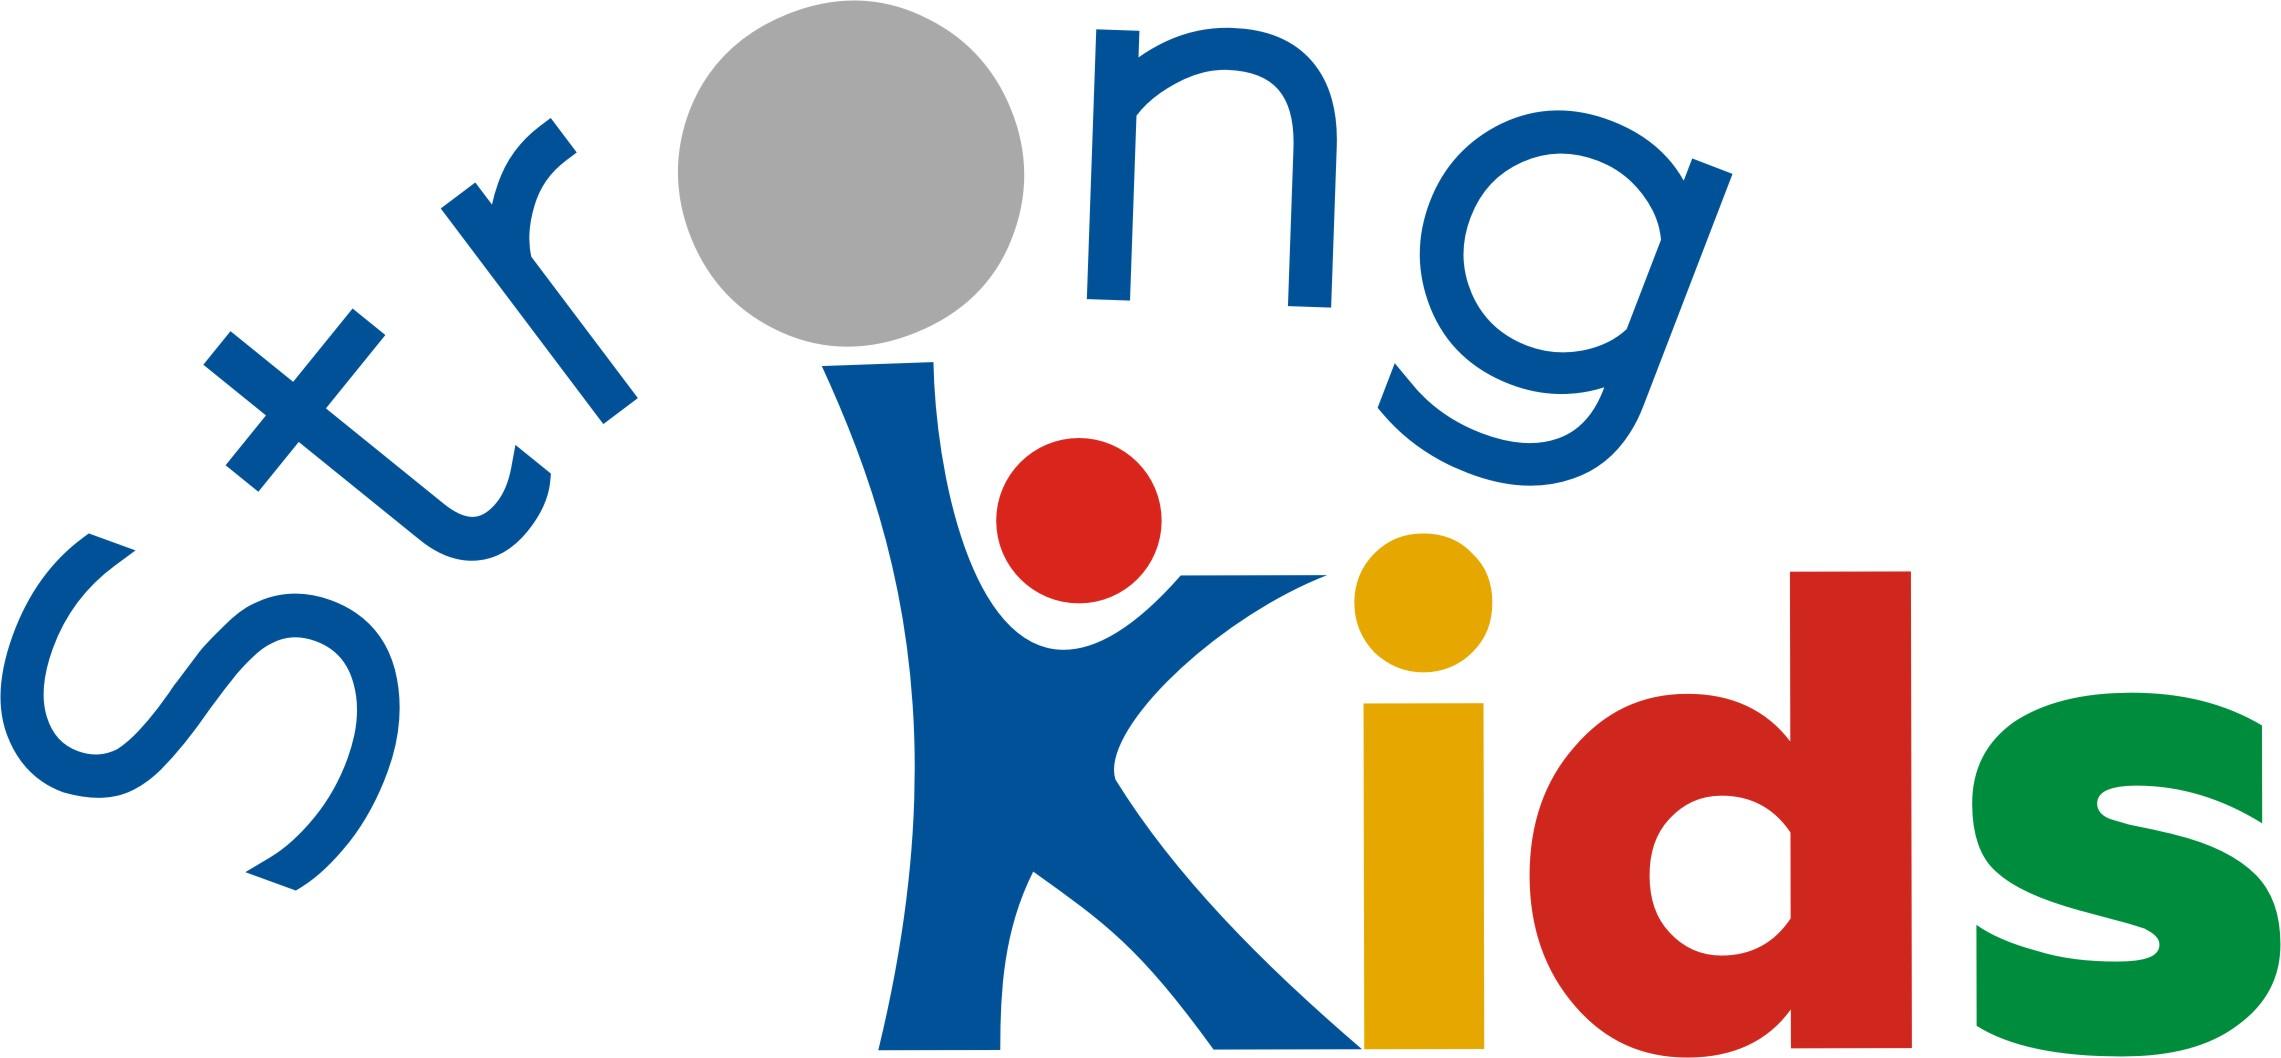 Логотип для Детского Интернет Магазина StrongKids фото f_4835c8912a9bee1d.jpg